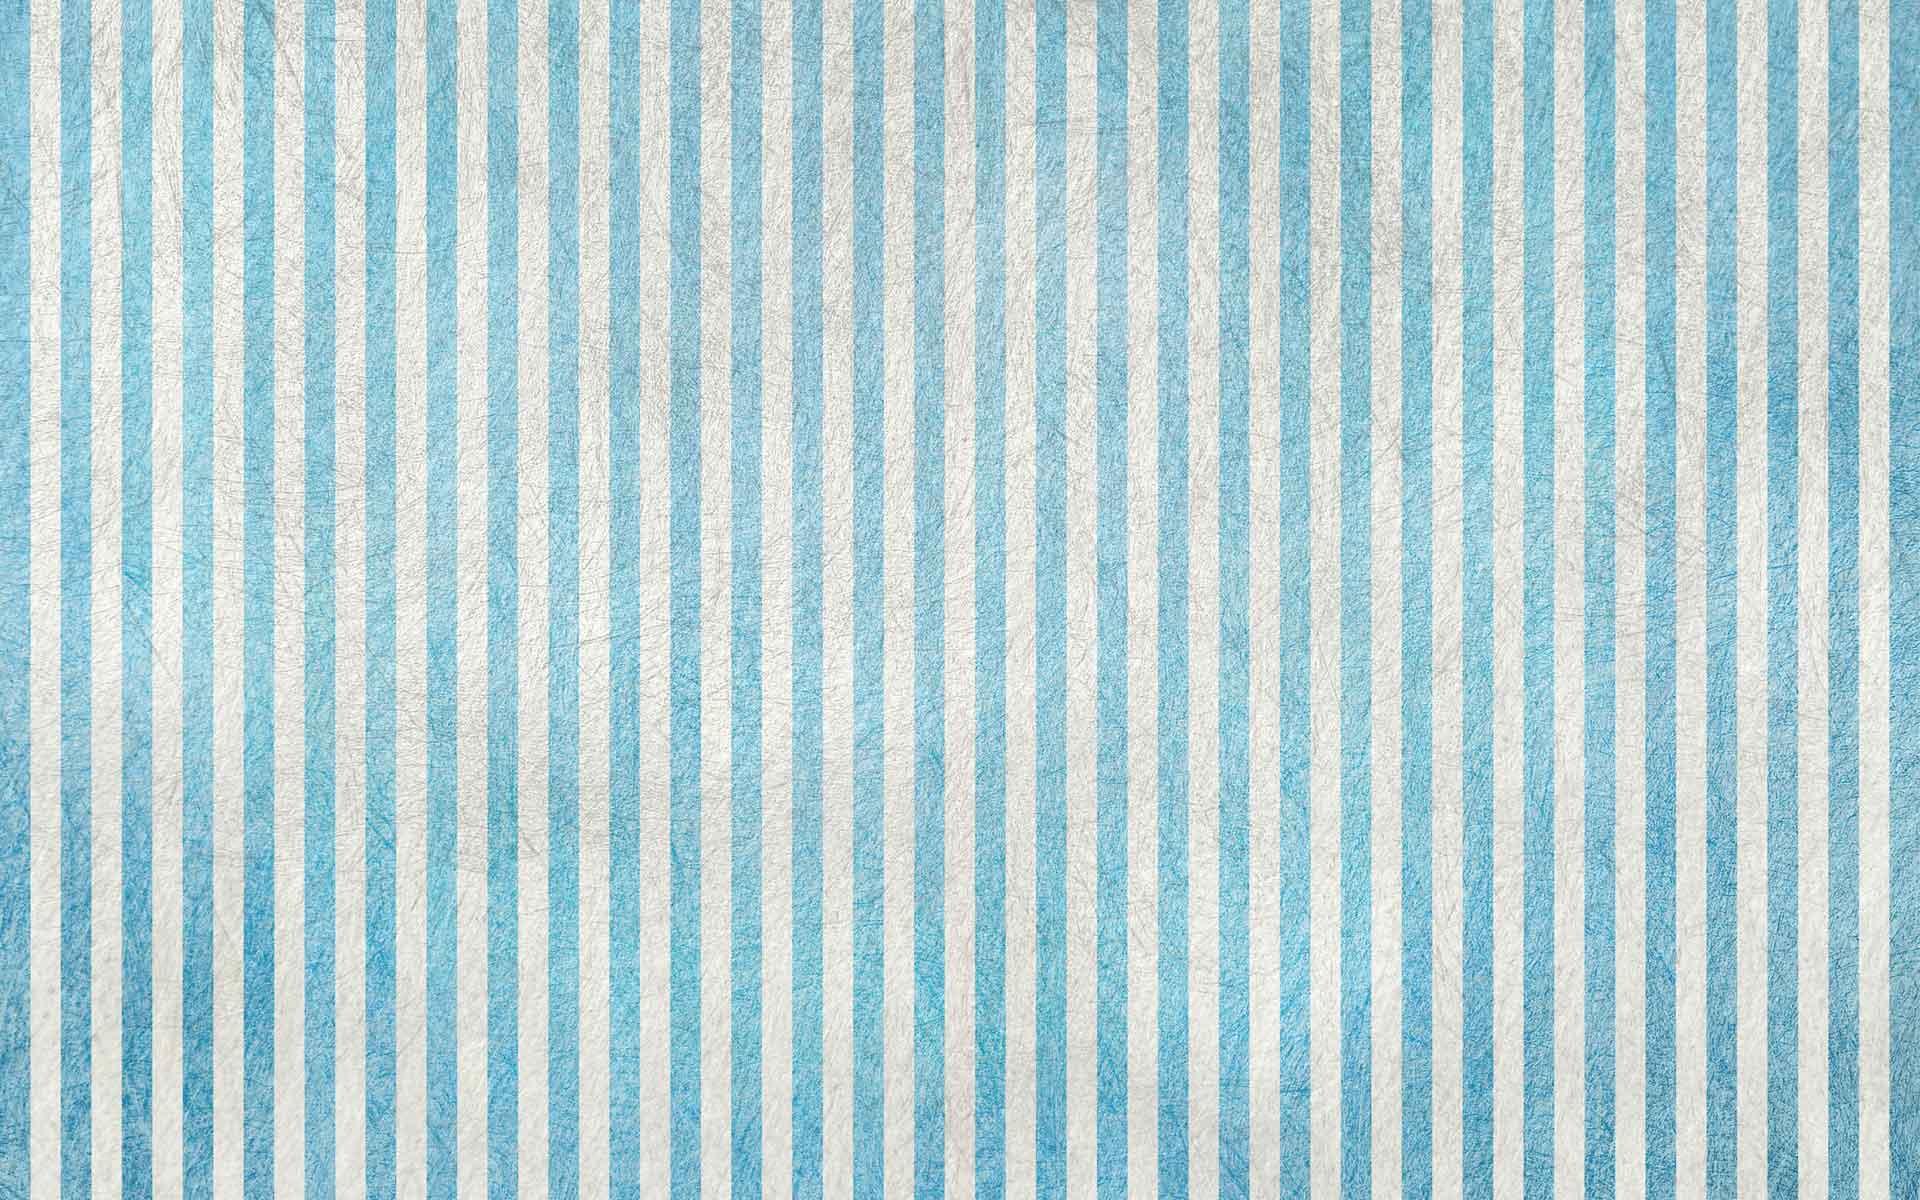 blue 3d Stripes Wallpapers